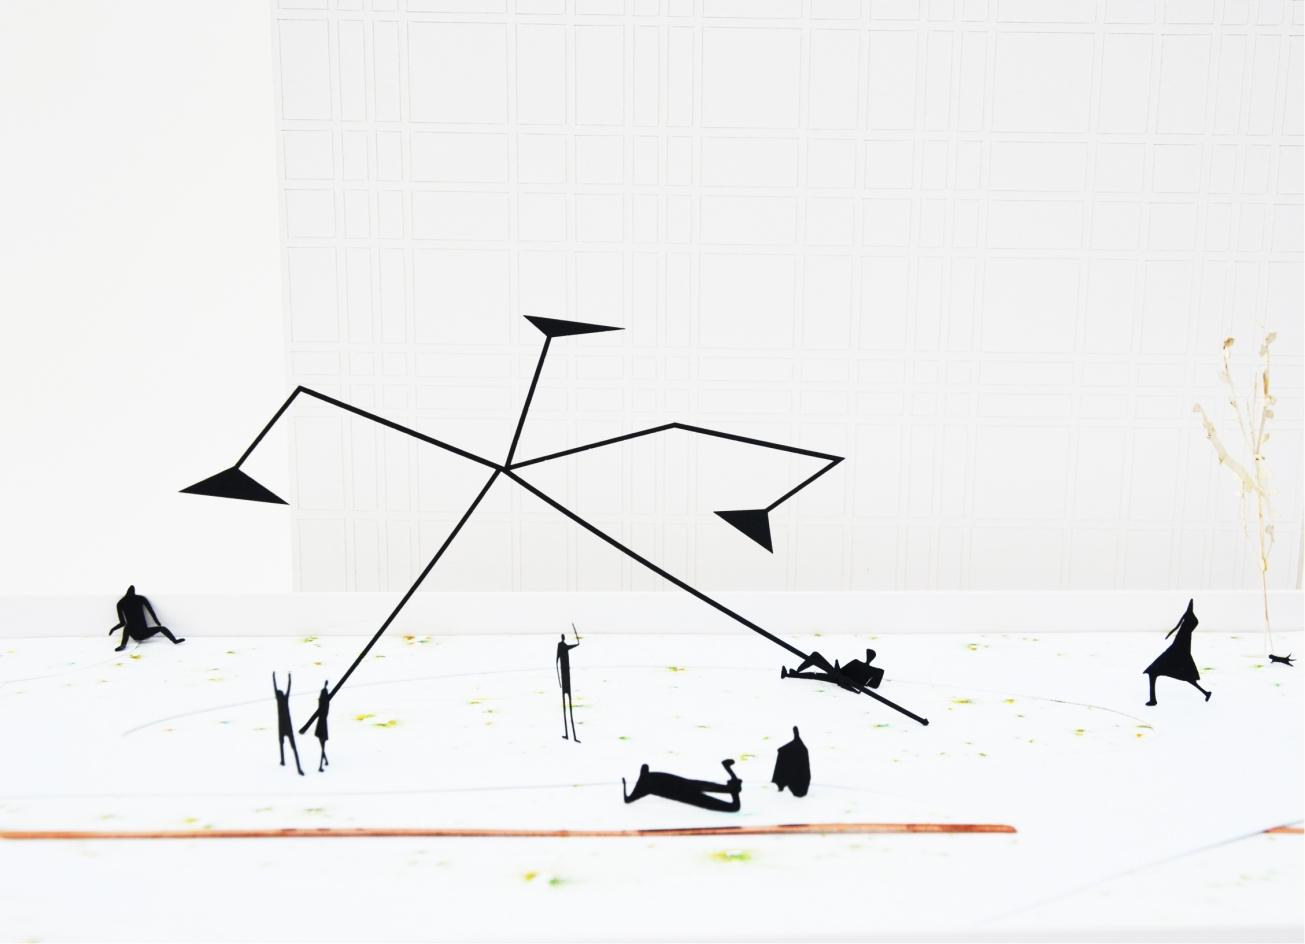 001 - ARTS DU SPECTACLS karina+borodaï . M2 . EPFL . MUSEUM PARK . HARRY GUGGER LABA